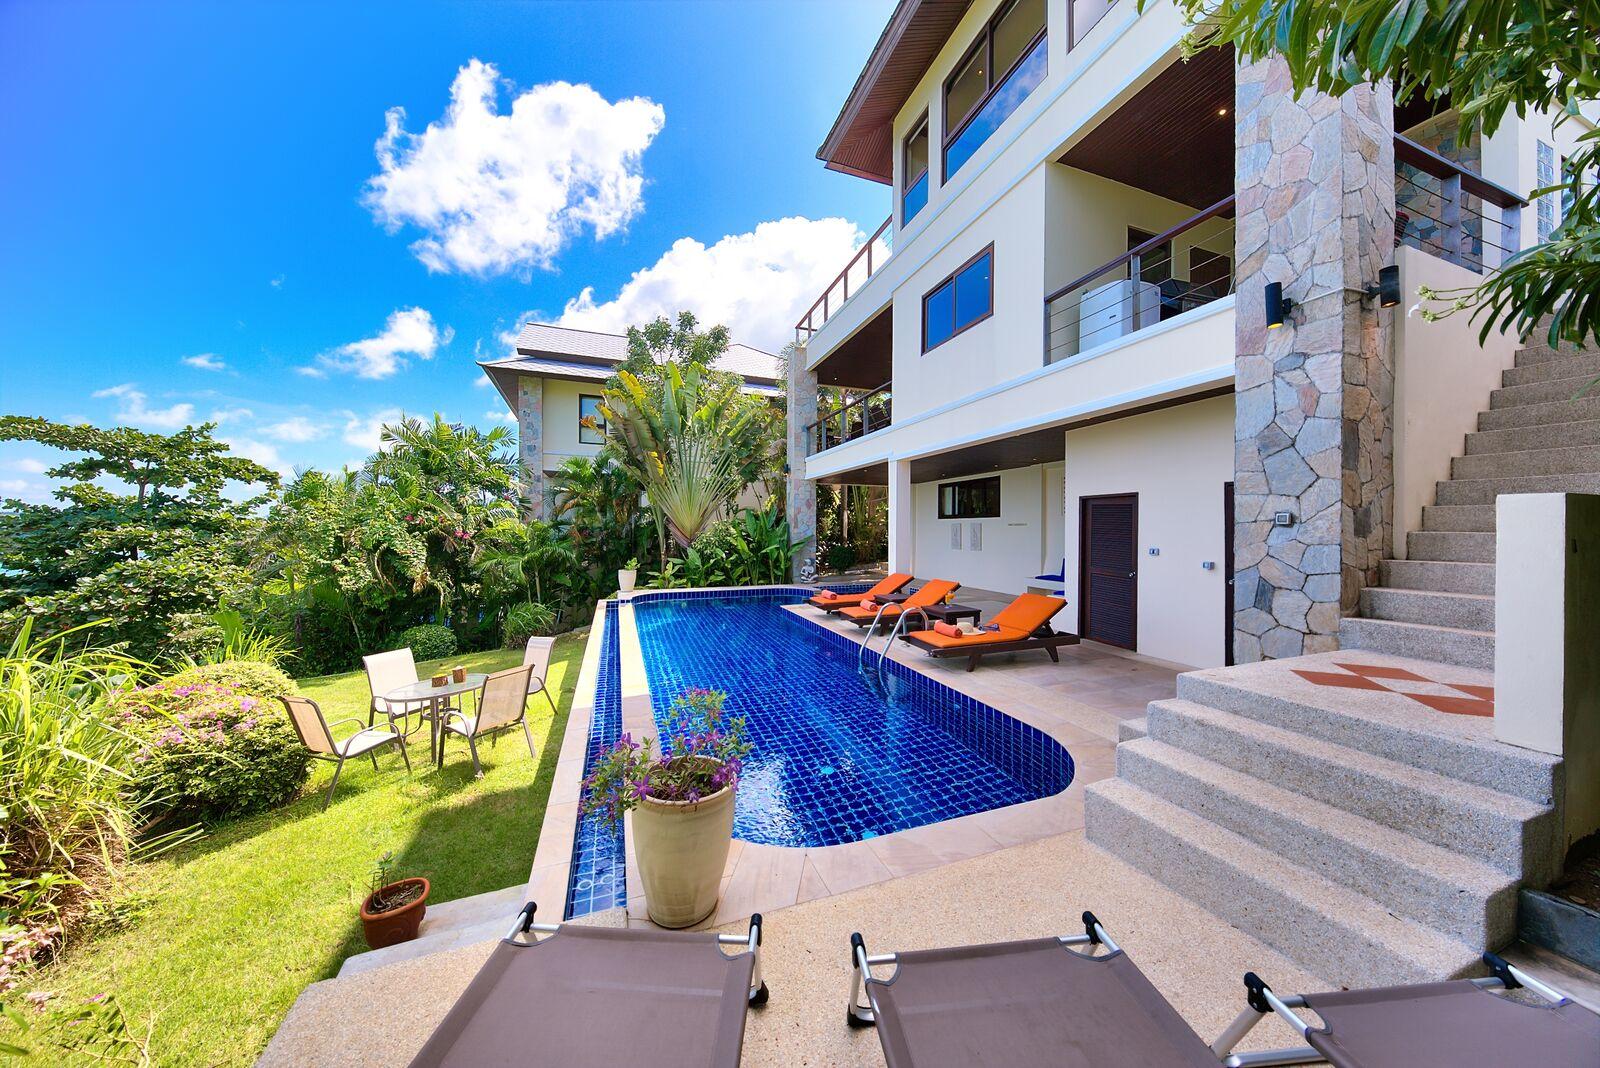 3 Bedroom Option Sea View Villa with Private Pool at Bangrak Koh Samui